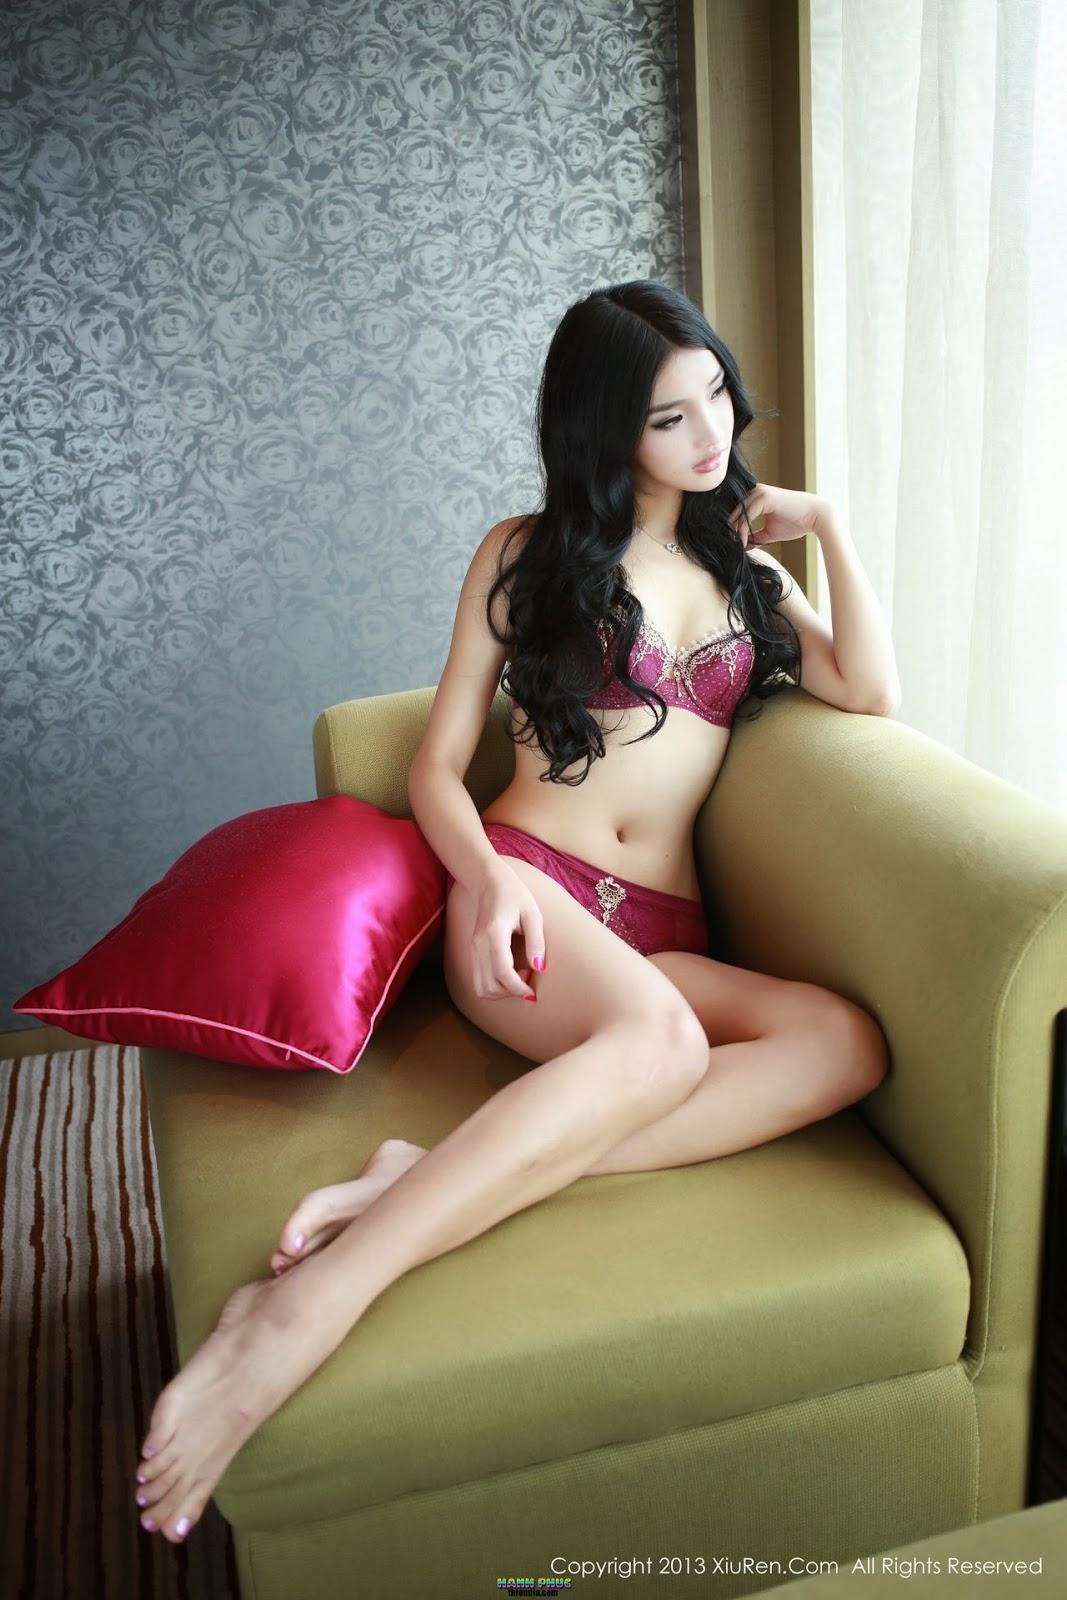 http://1.bp.blogspot.com/-8IEPnoCZxyQ/Ut1QPSehAFI/AAAAAAAAGZk/fq6esMMTEv8/s1600/0026.jpg